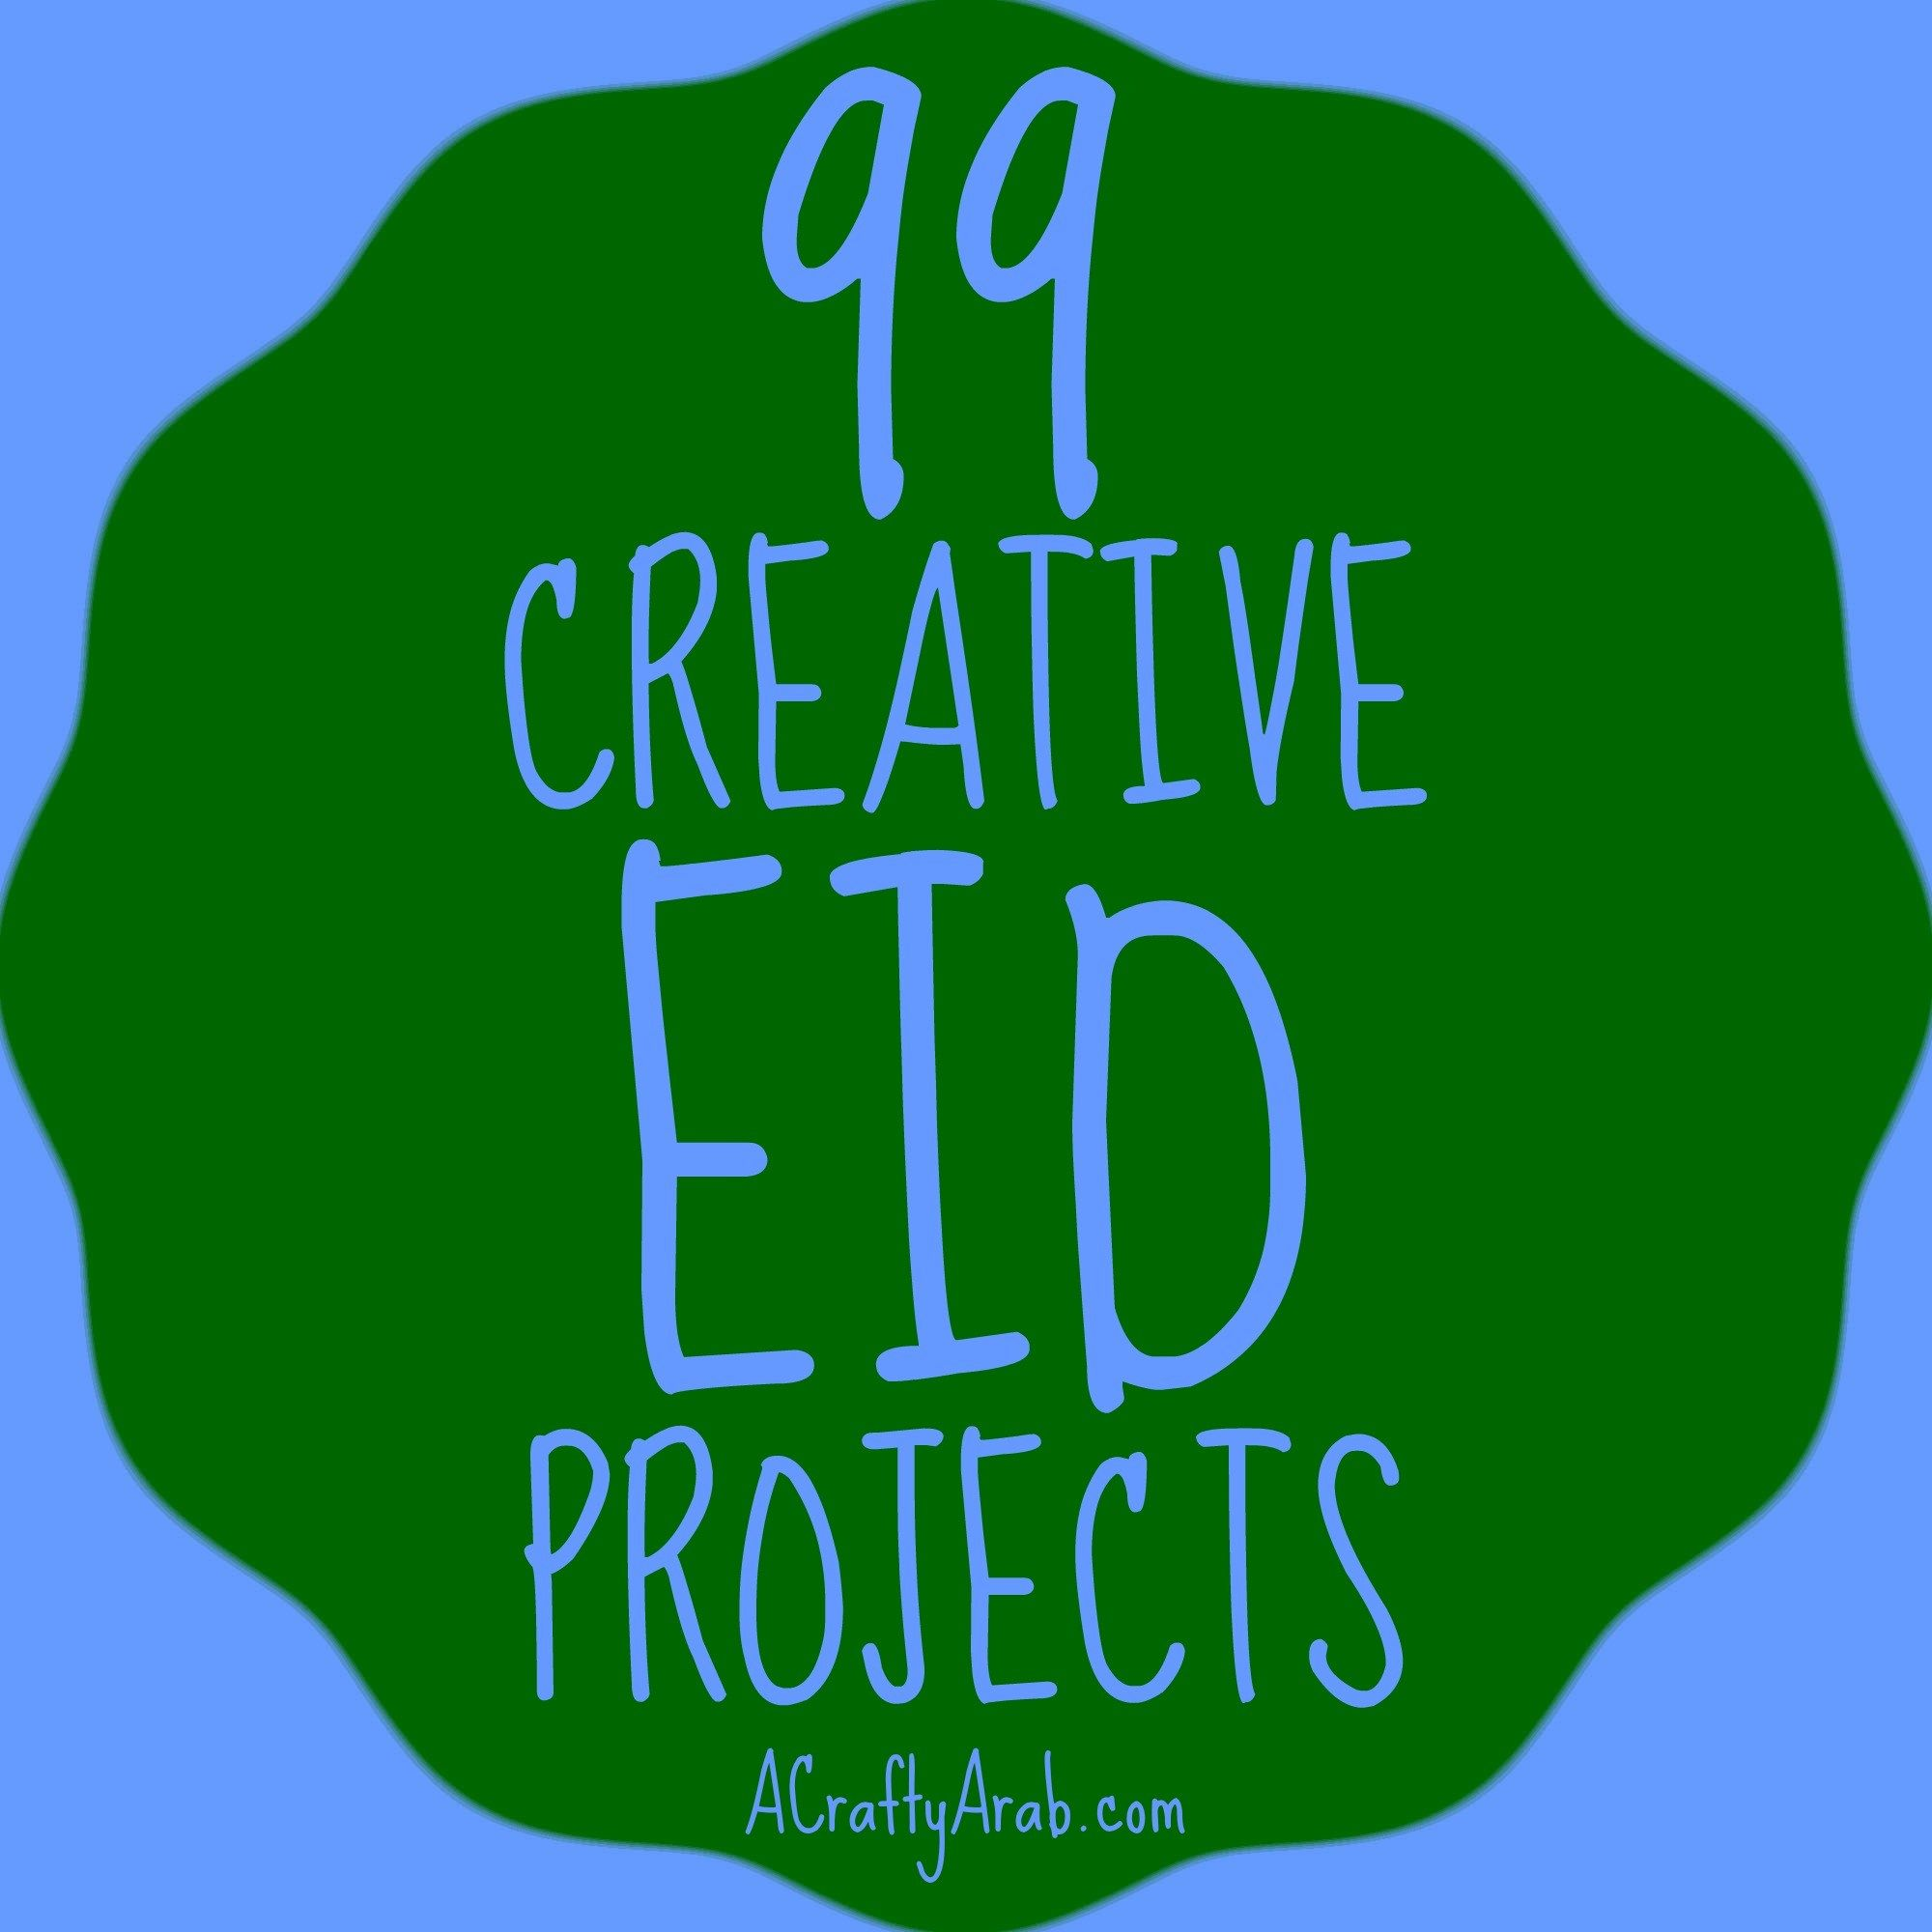 Simple Hindi Wikipedia Eid Al-Fitr Feast - 8350f1602847b3136716741049b33a43  You Should Have_384359 .jpg